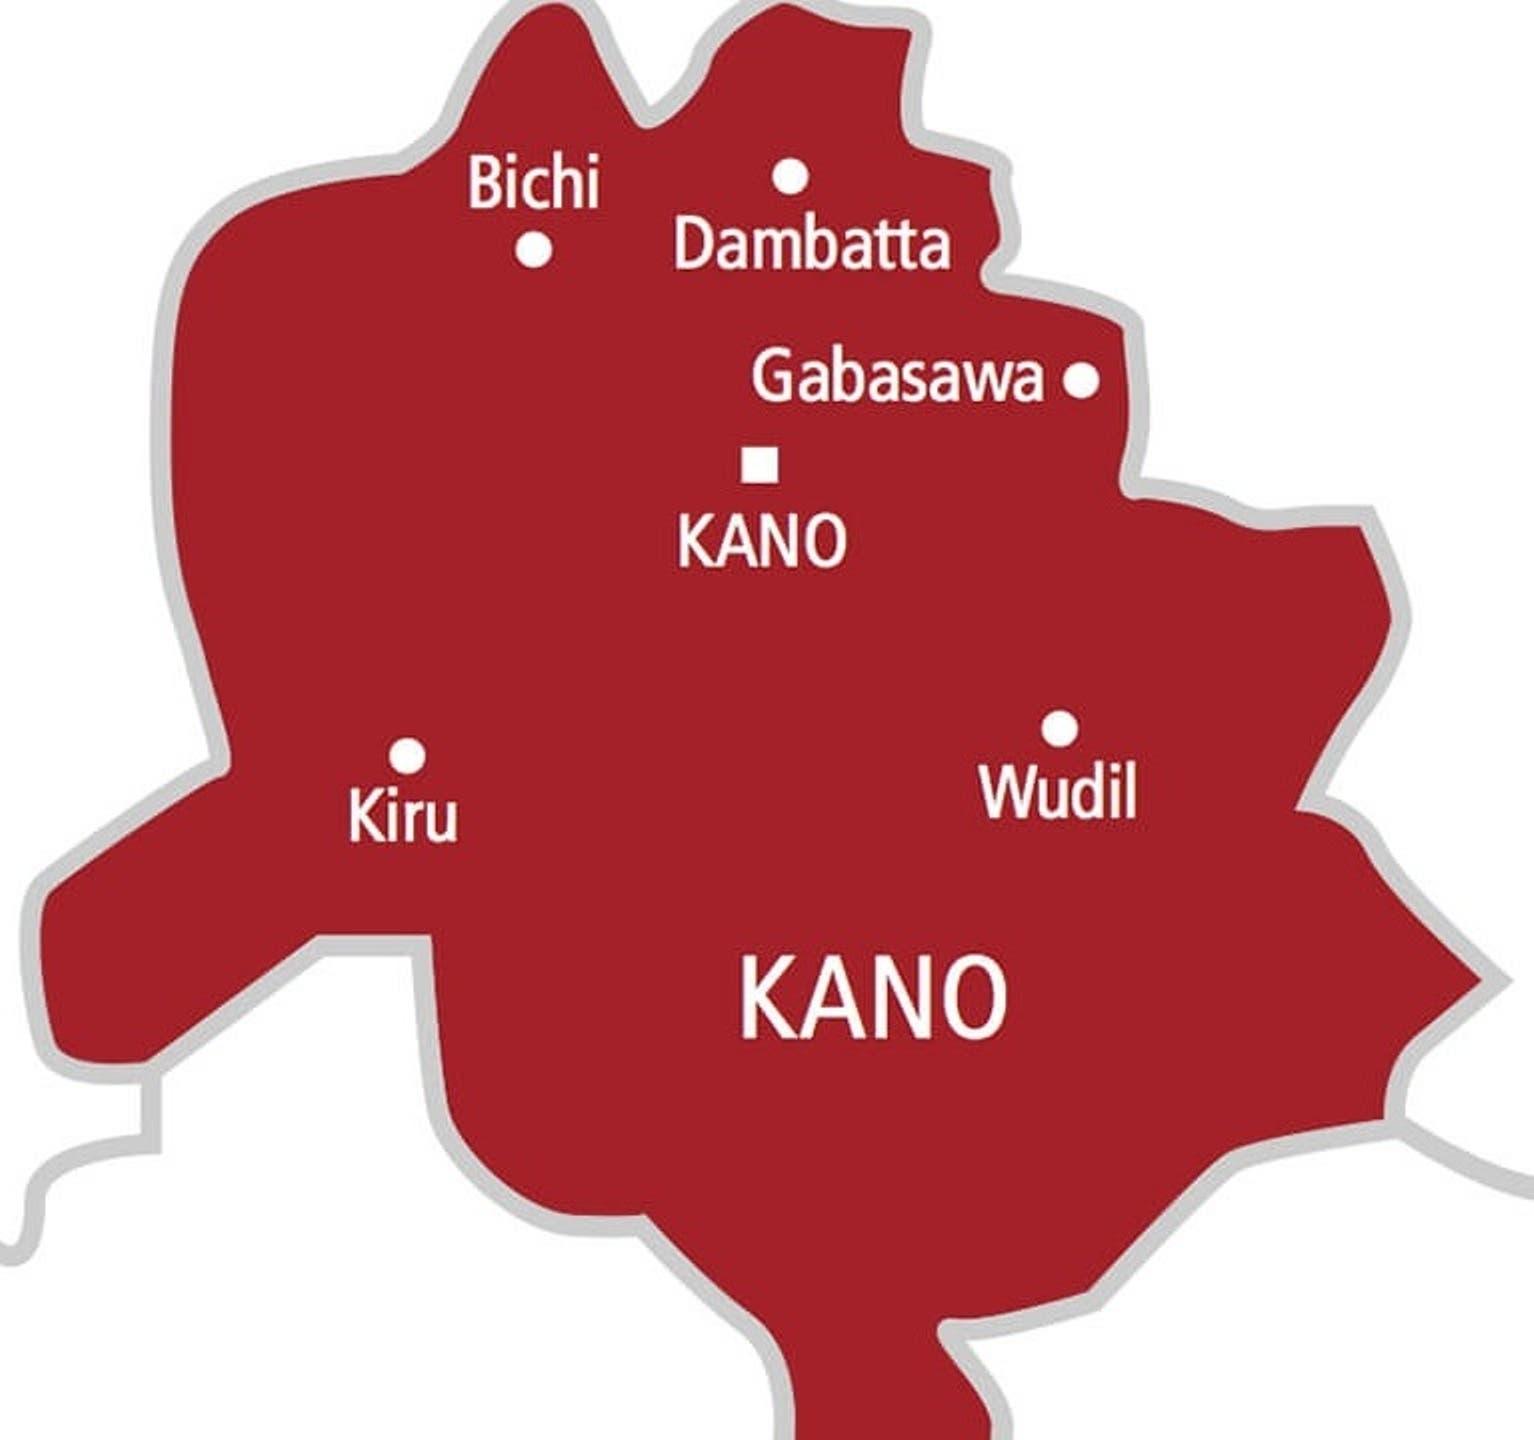 Nigeria news : Kano Govt orders immediate closure of all schools